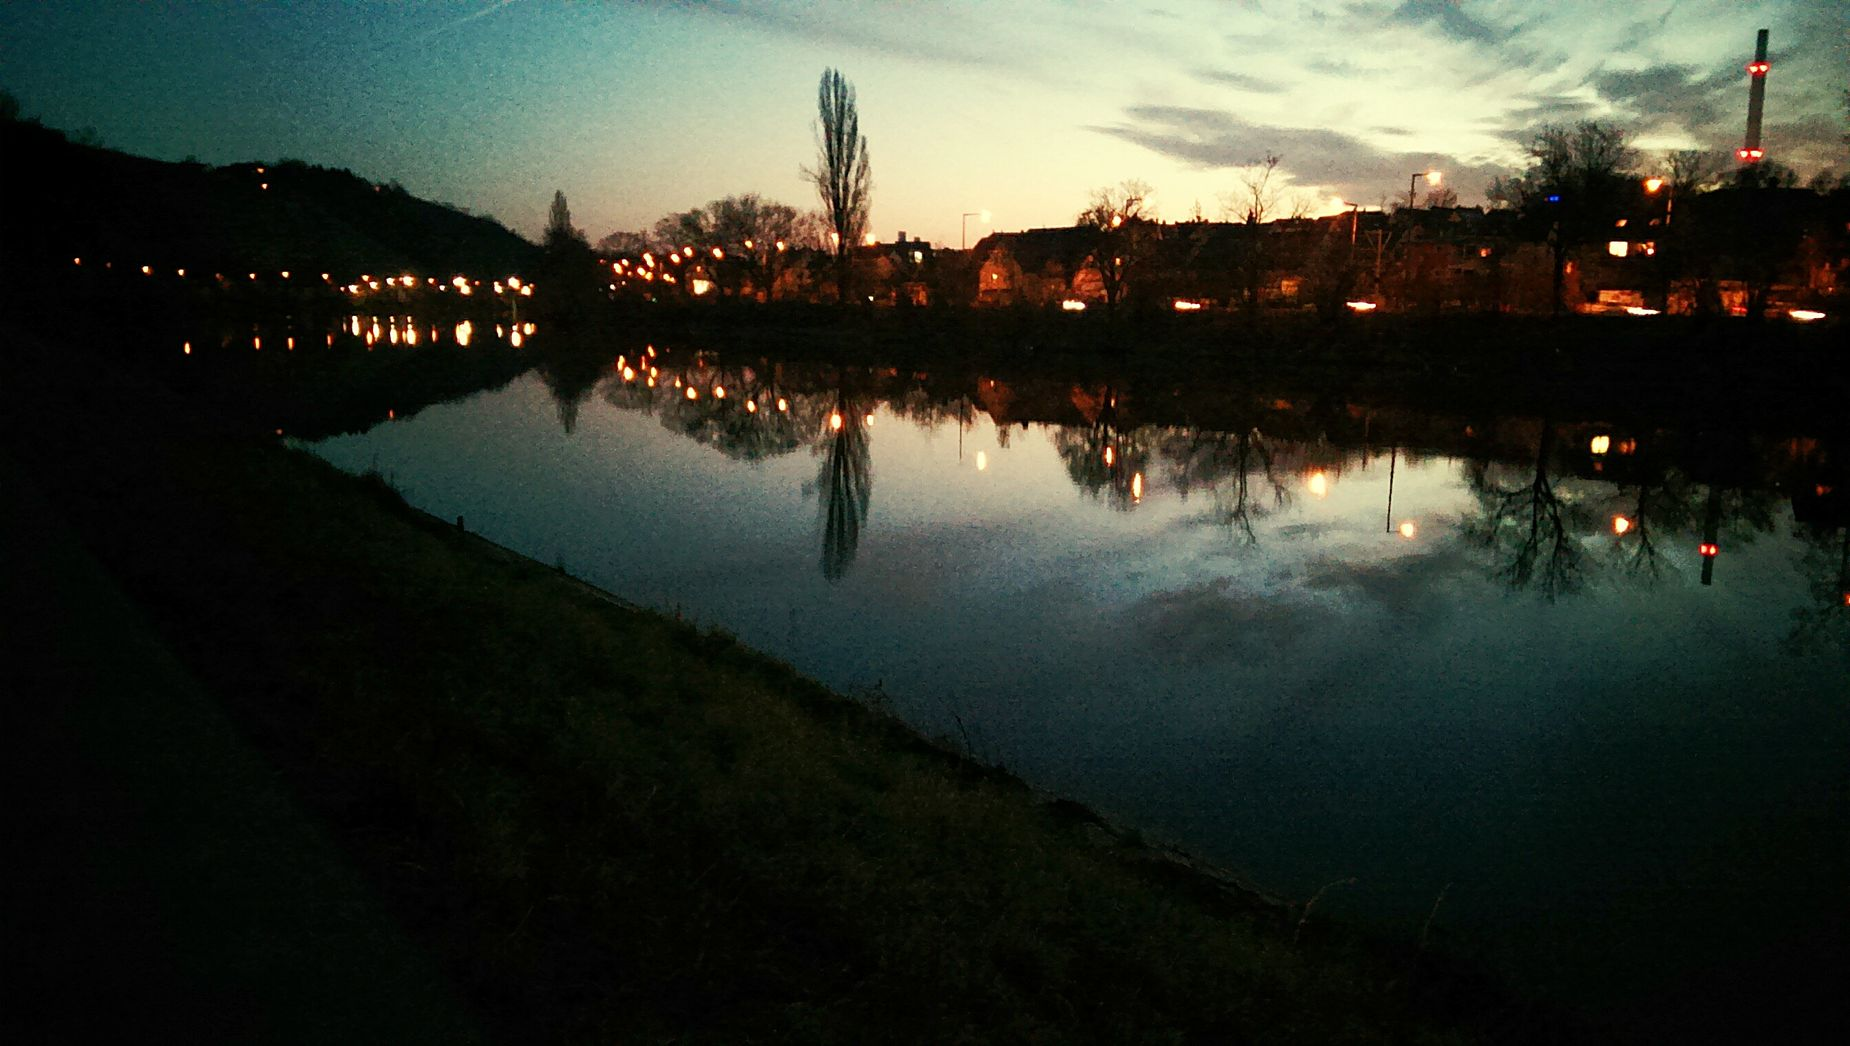 Freelance Life Hanging Out Taking Photos Relaxing Enjoying Life Water Neckar Dezember 2015 Sunset Pretty Love Stuttgart